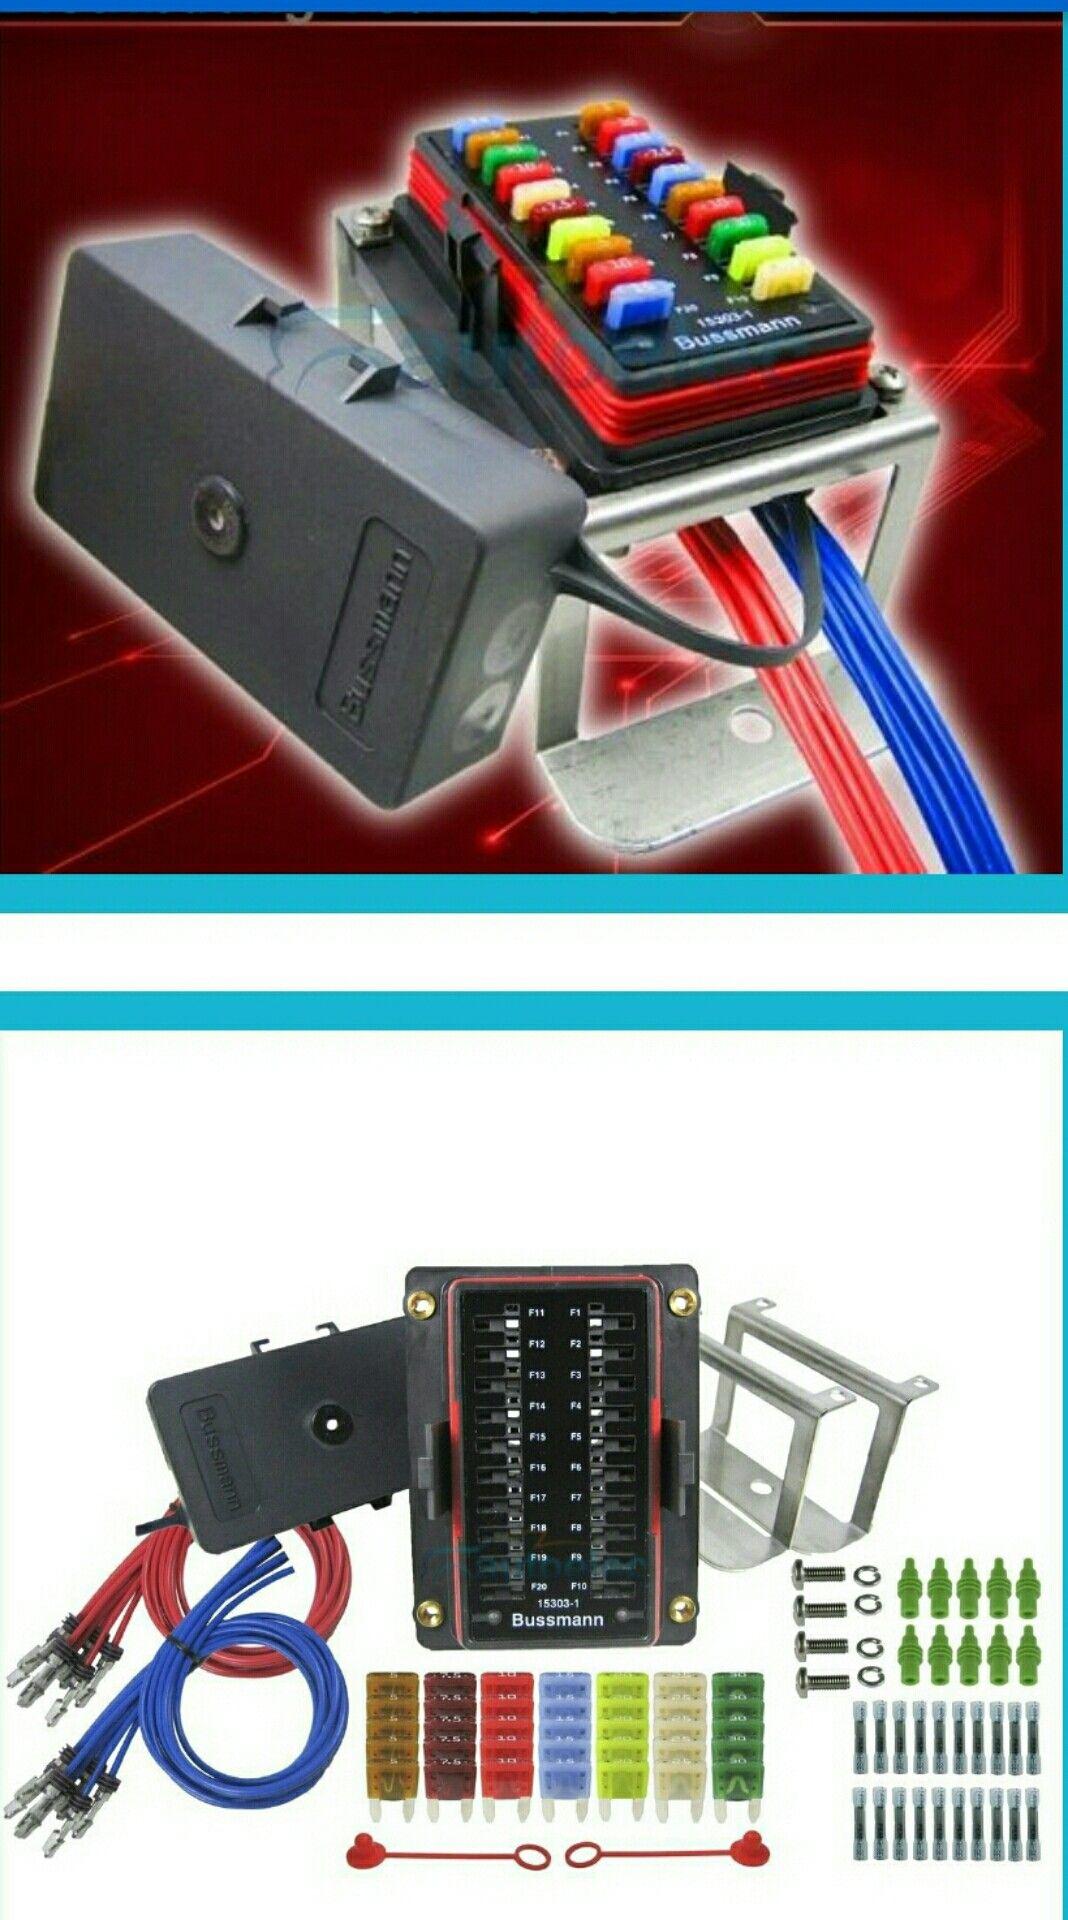 medium resolution of car audio bussmann 20 mini fuse holder ip66 diy electronics electronics projects k5 blazer ice